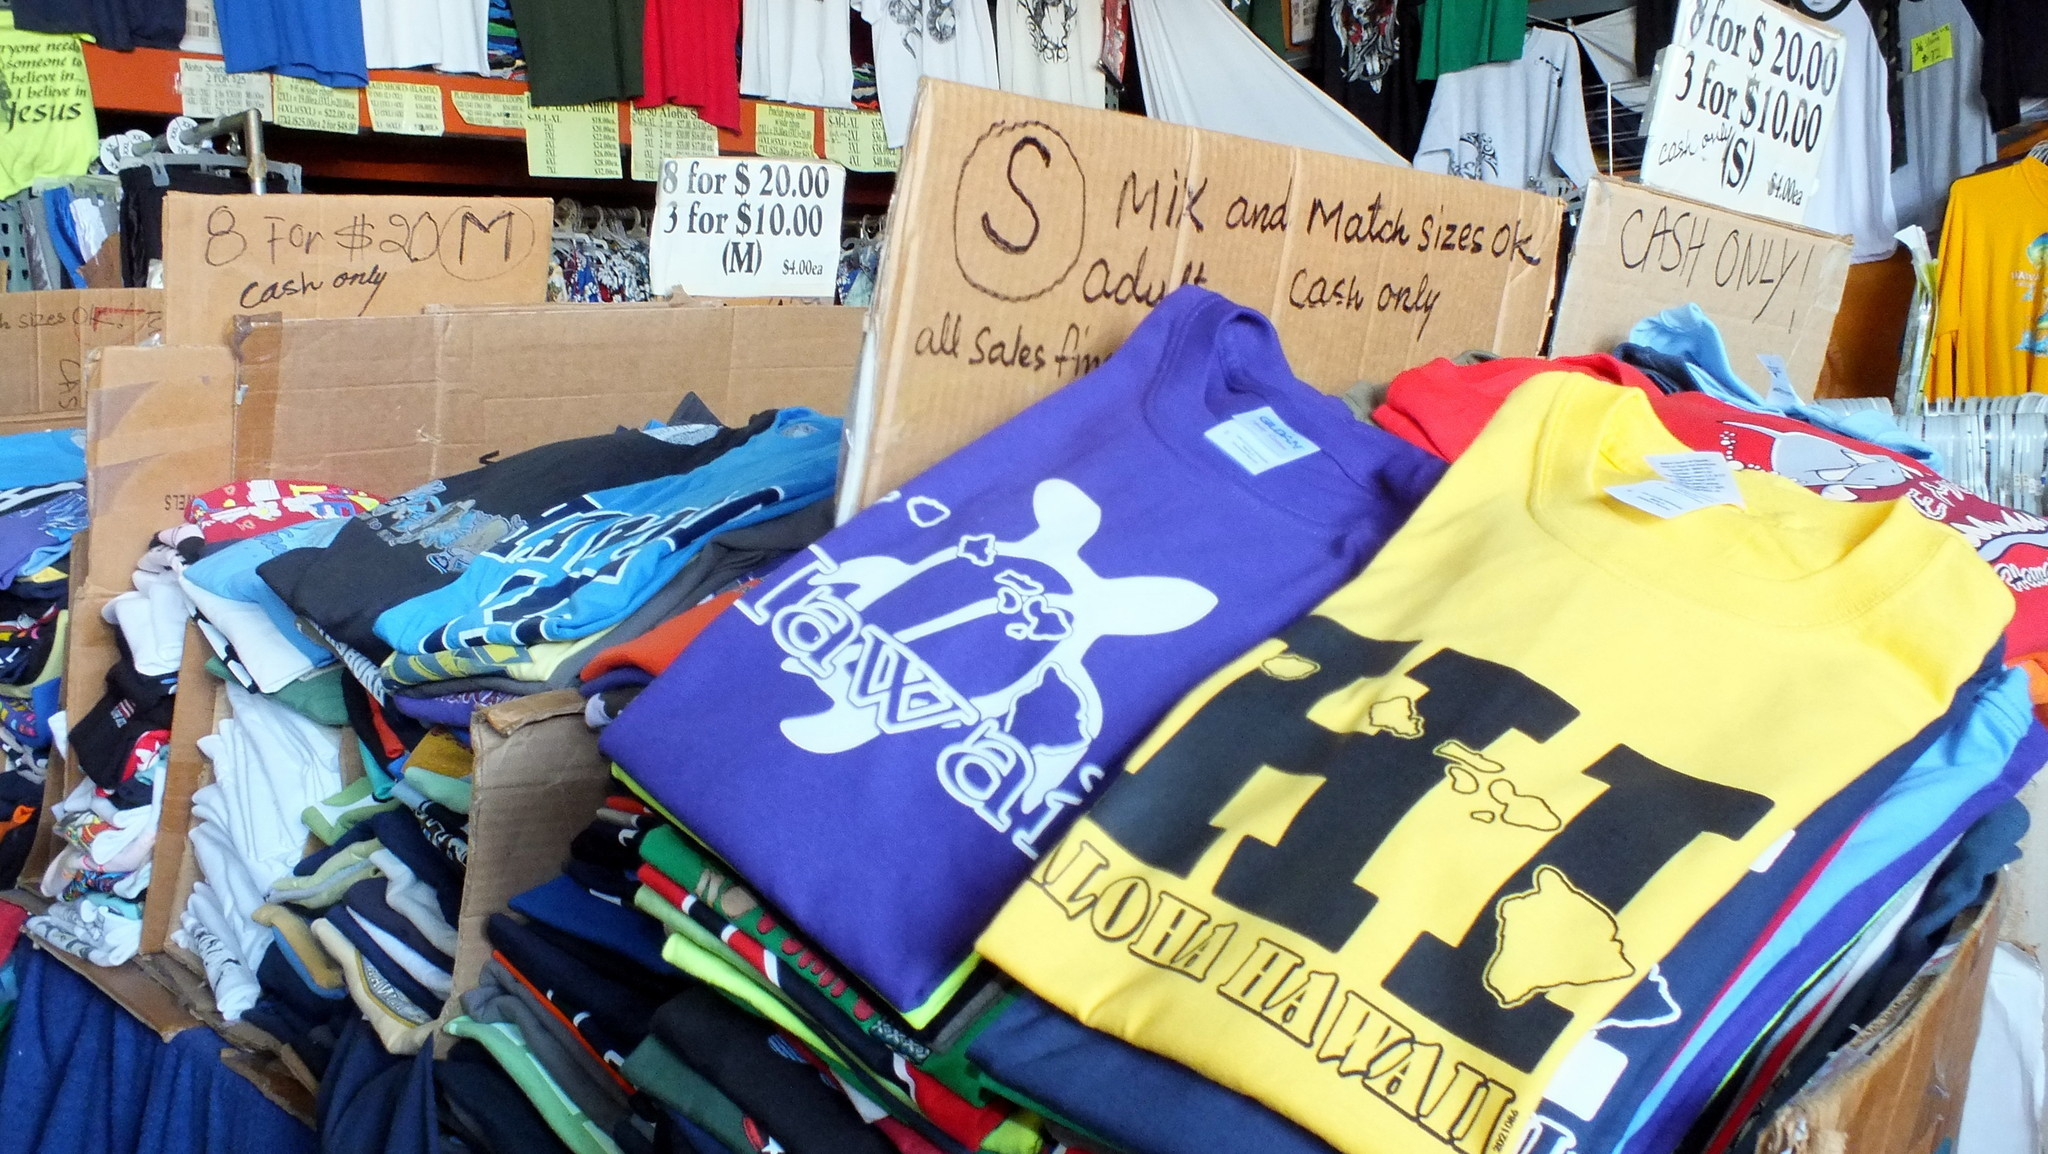 Here 39 s an insider secret a bargain t shirt shop in for Hawaii souvenir t shirts